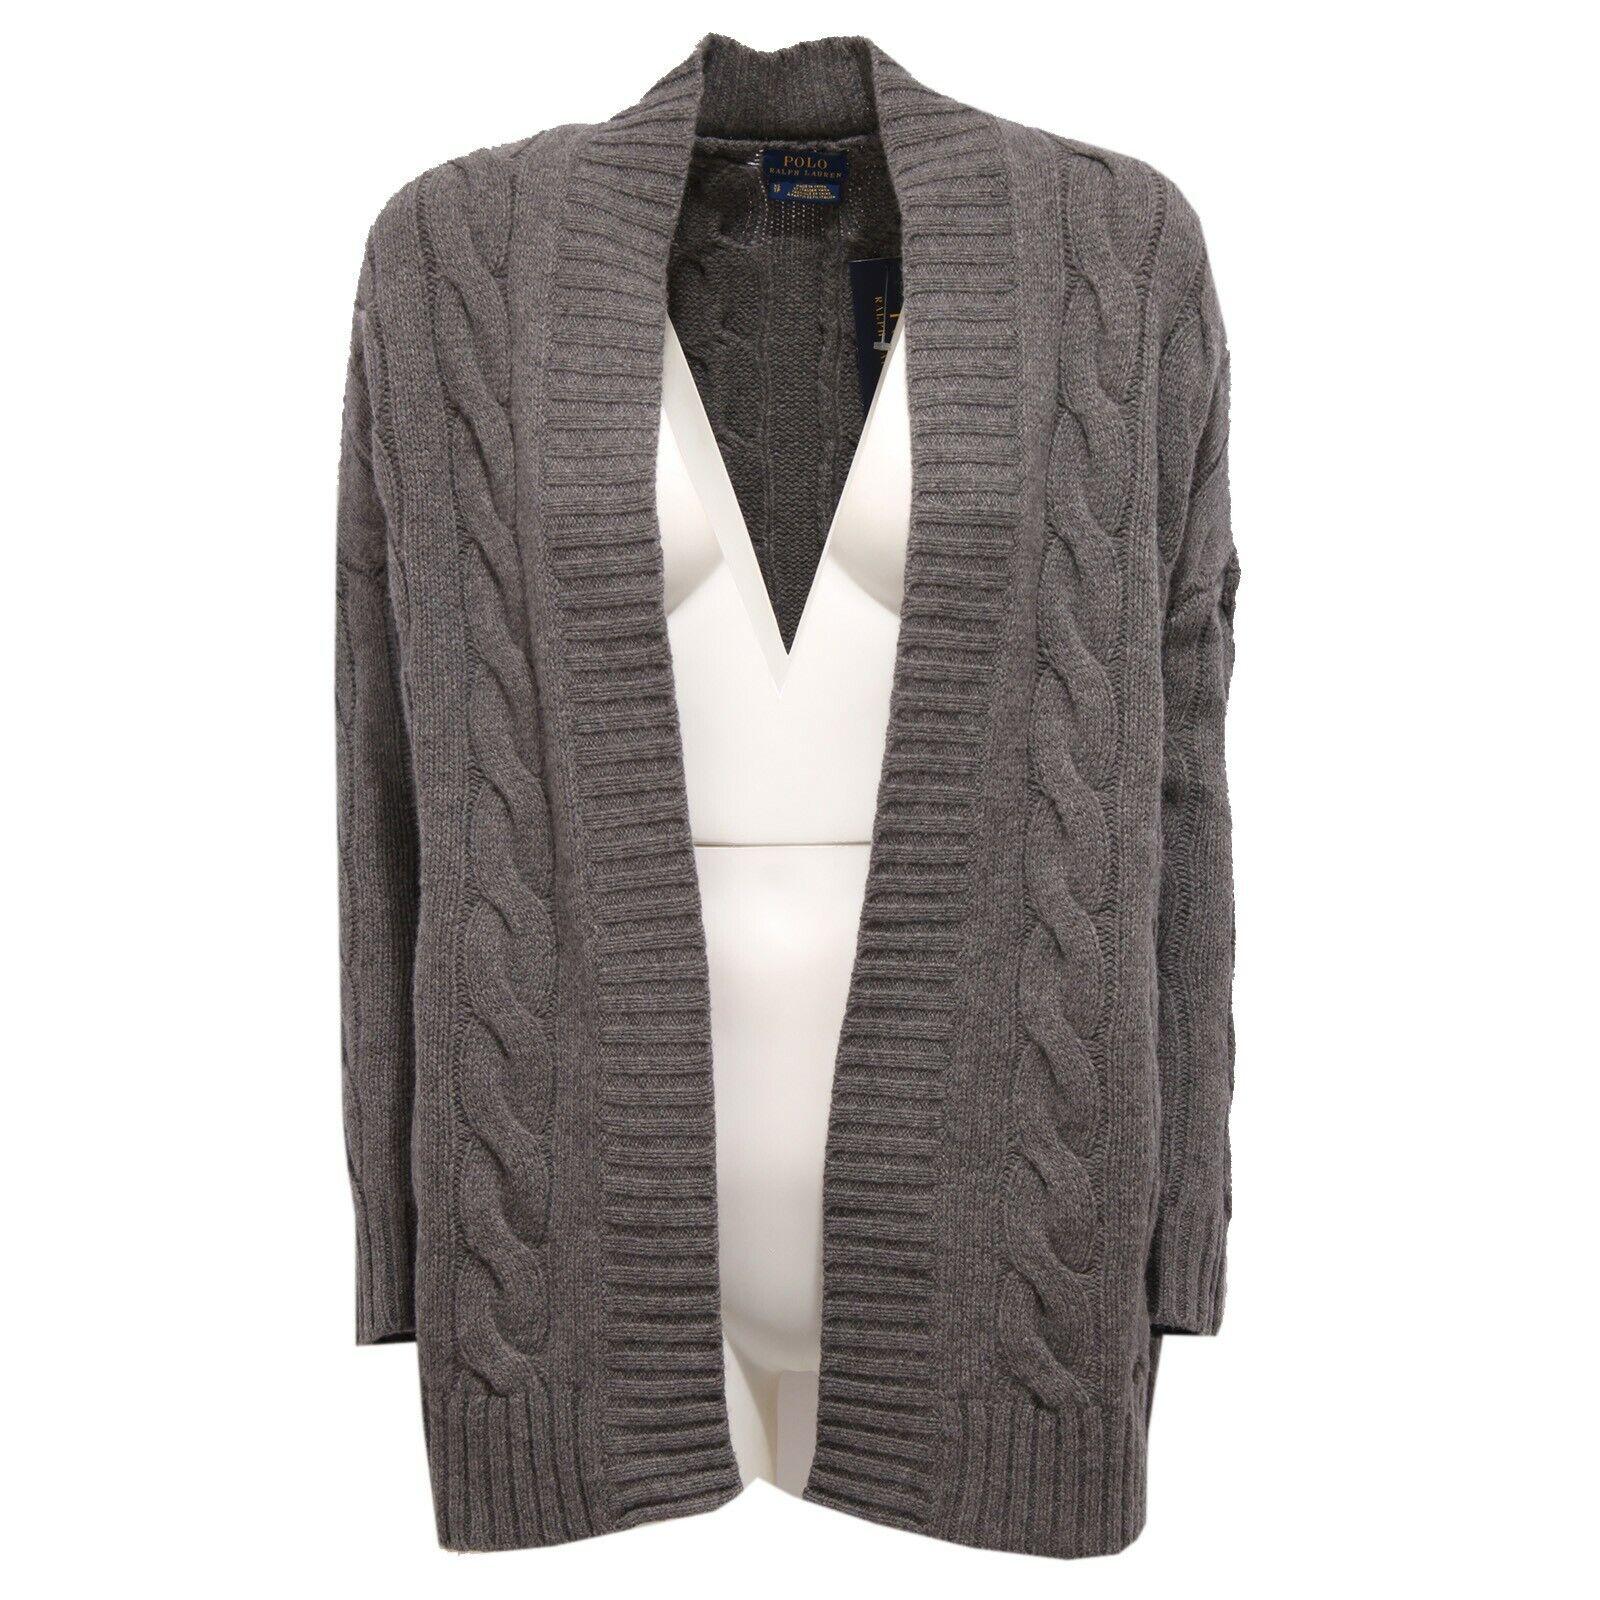 0082K bildigan Aperto kvinnor Polo Ralph Lauren grå Wool  Cashmere tröja kvinna